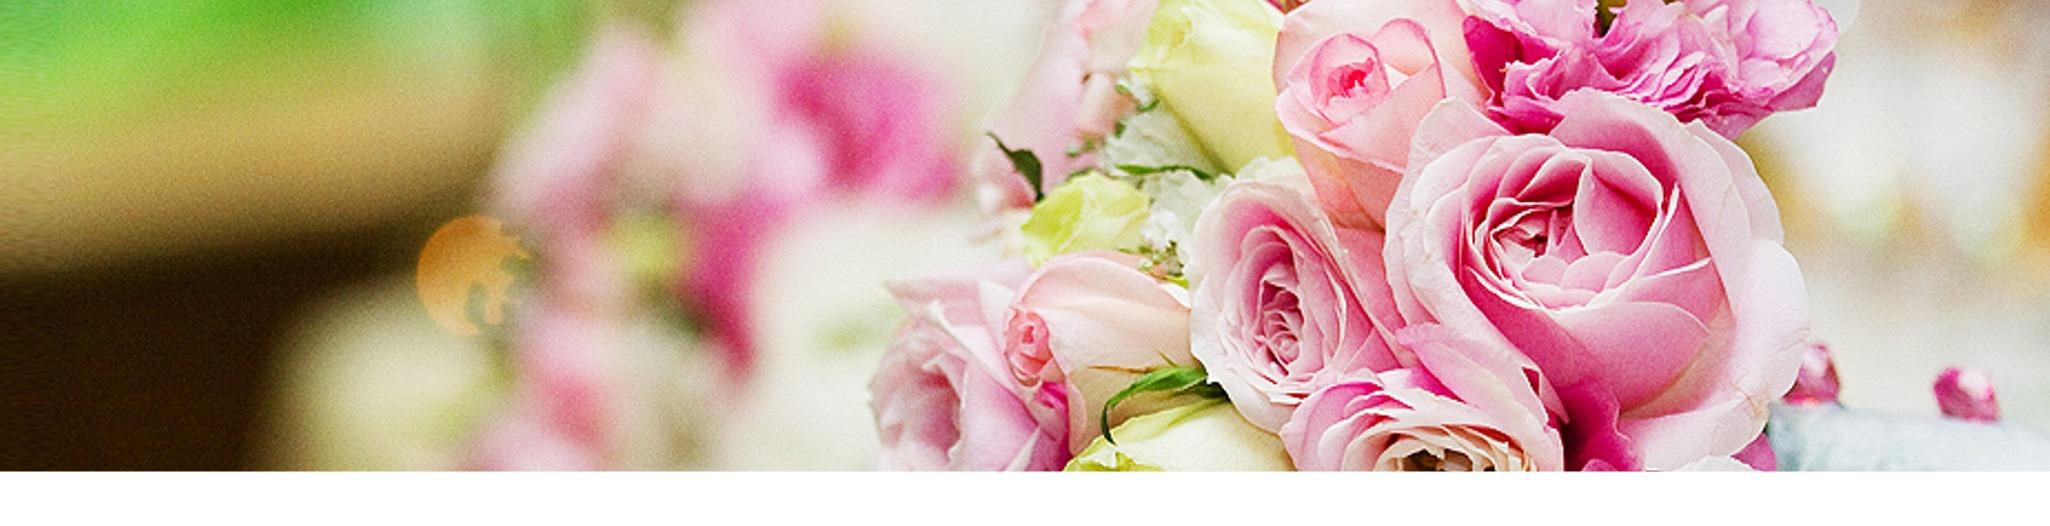 Overseasflowerdelivery international fresh flower delivery by overseasflowerdelivery international fresh flower delivery by worldwide florists network izmirmasajfo